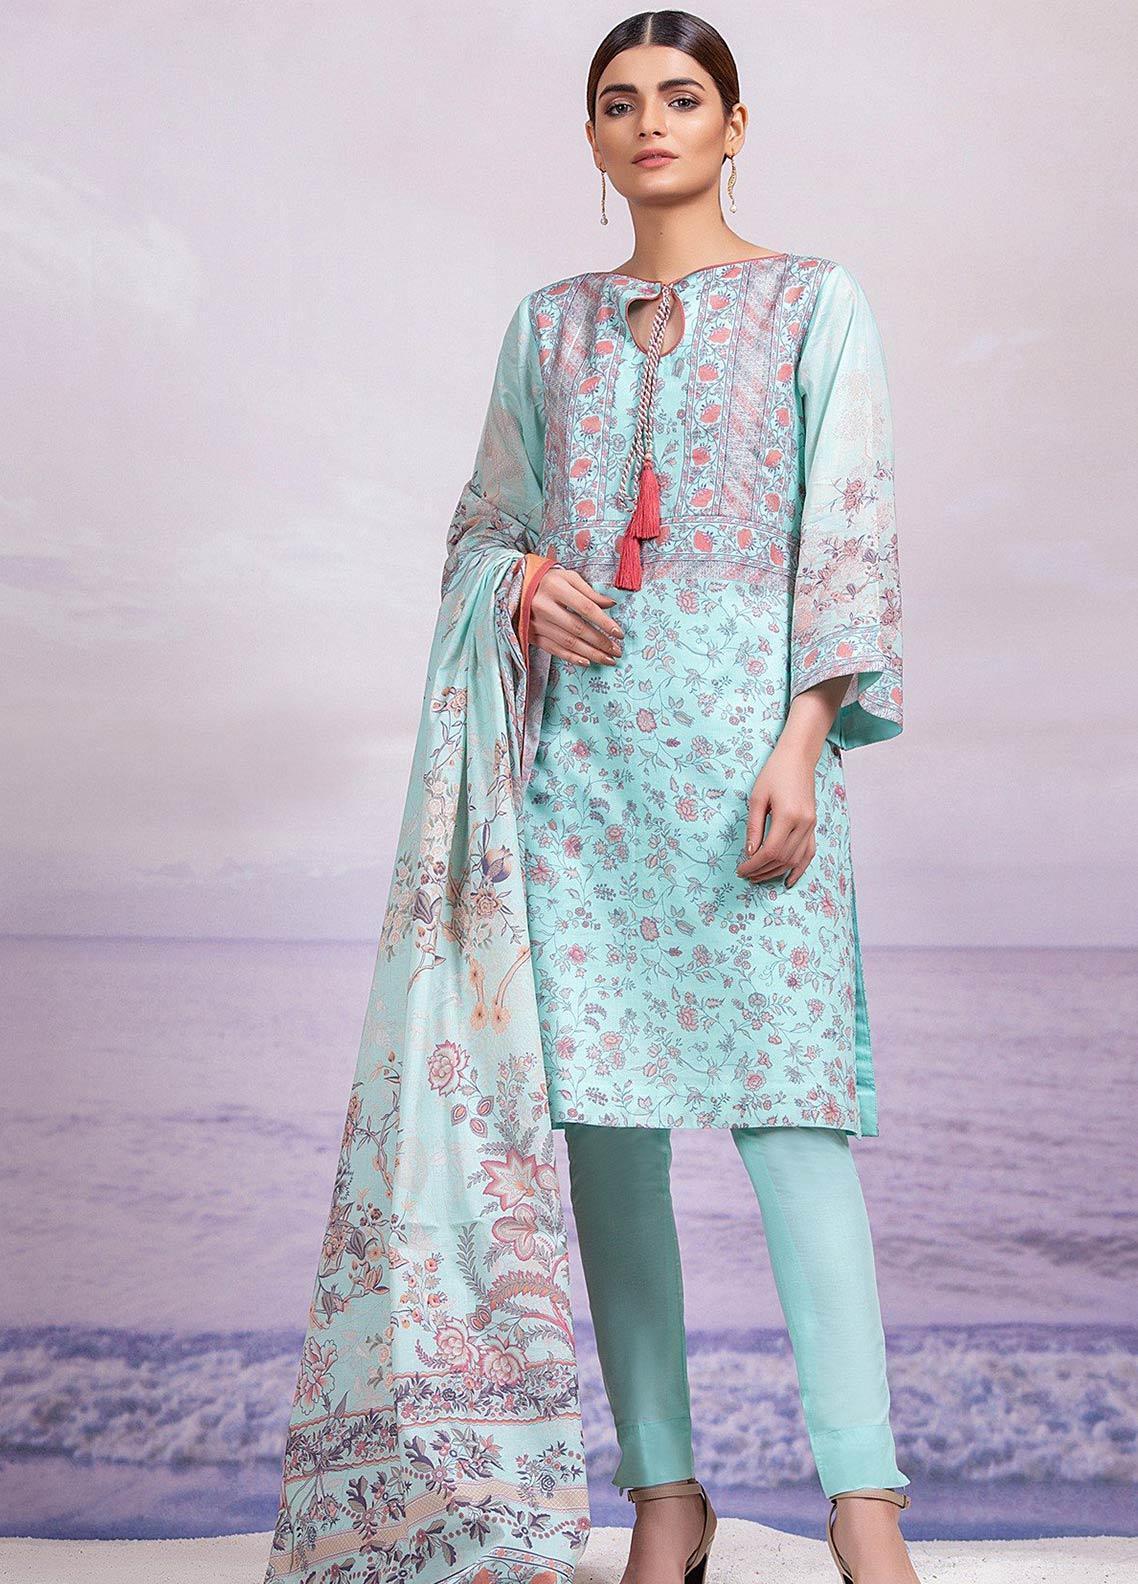 Al Karam Printed Lawn Unstitched 3 Piece Suit AK19-L2 6.1 GREEN - Spring / Summer Collection